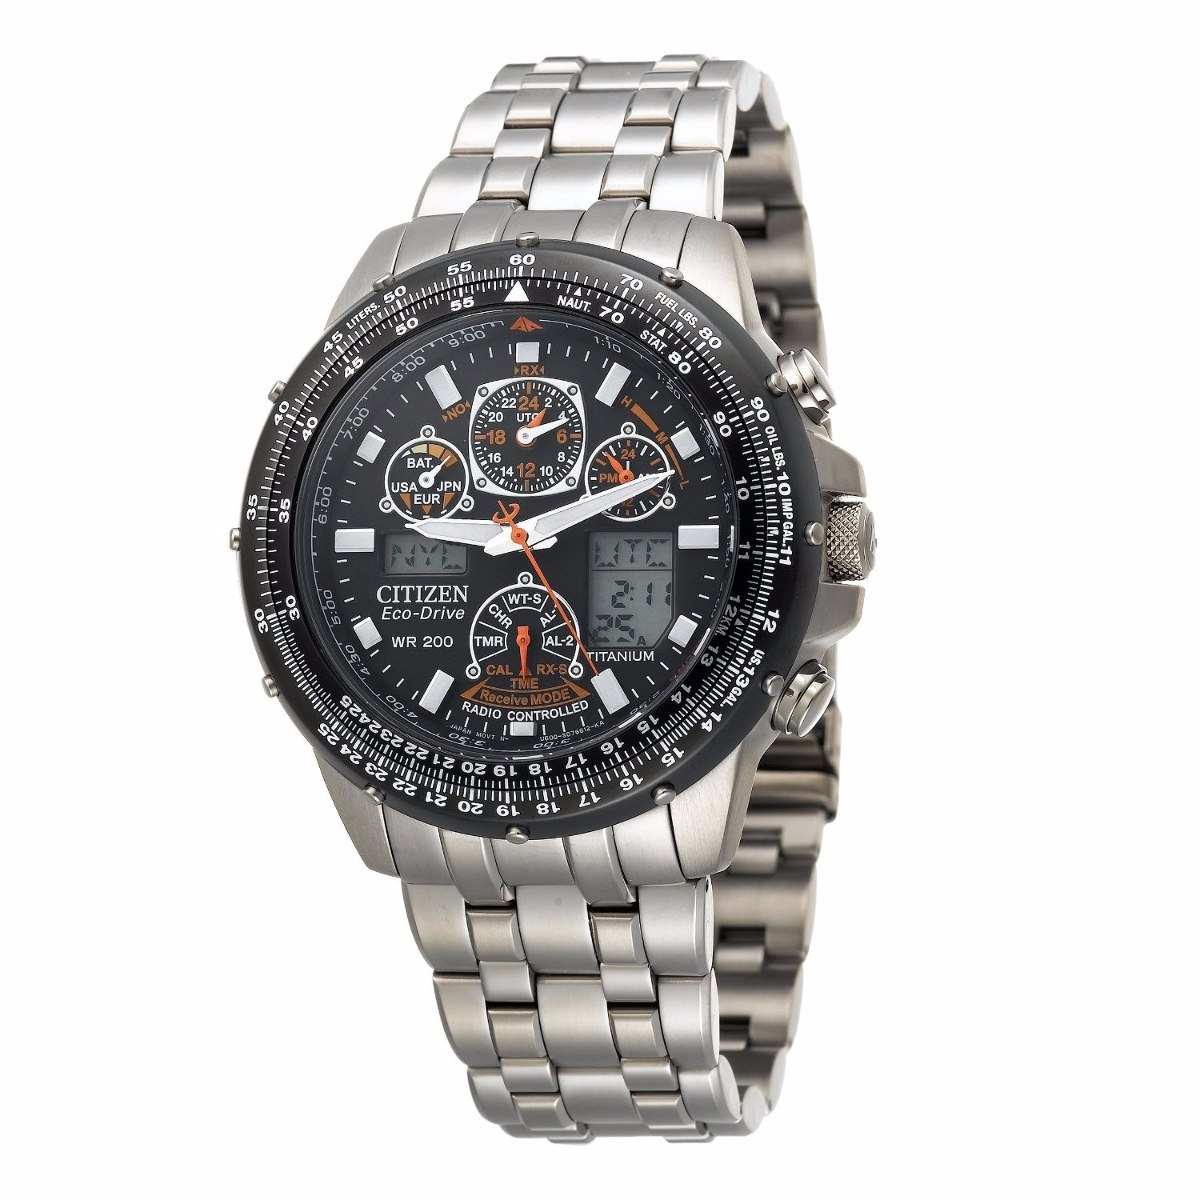 17a58800899 relógio citizen eco-drive titanium skyhawk jy0010-50e. Carregando zoom.